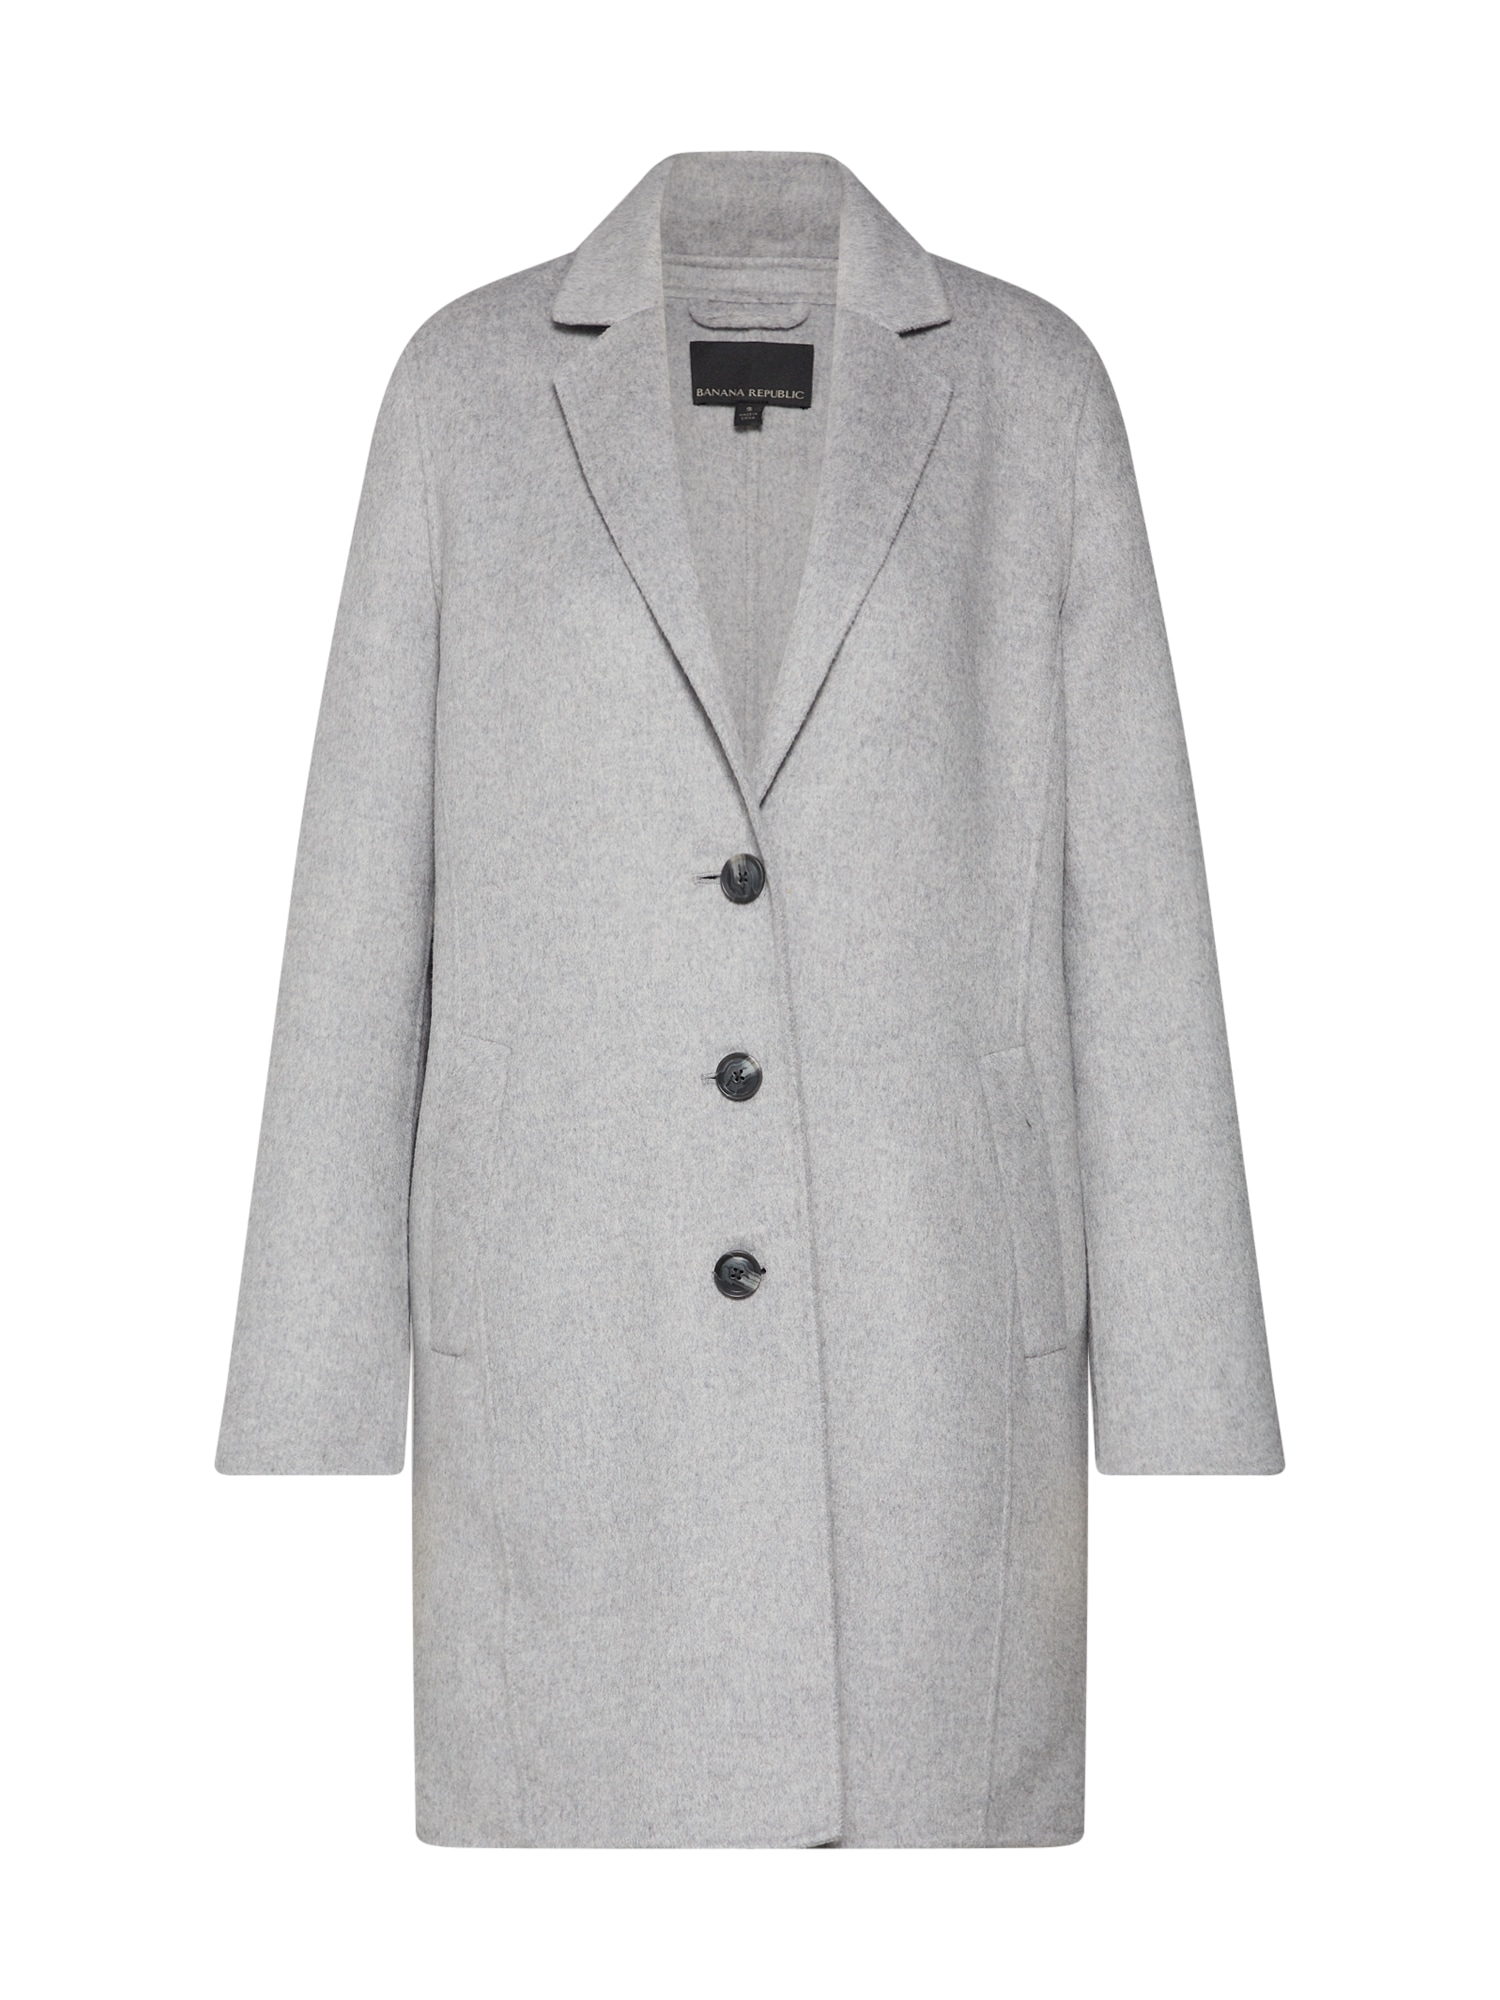 Přechodný kabát DOUBLE FACE TOP COAT šedý melír Banana Republic